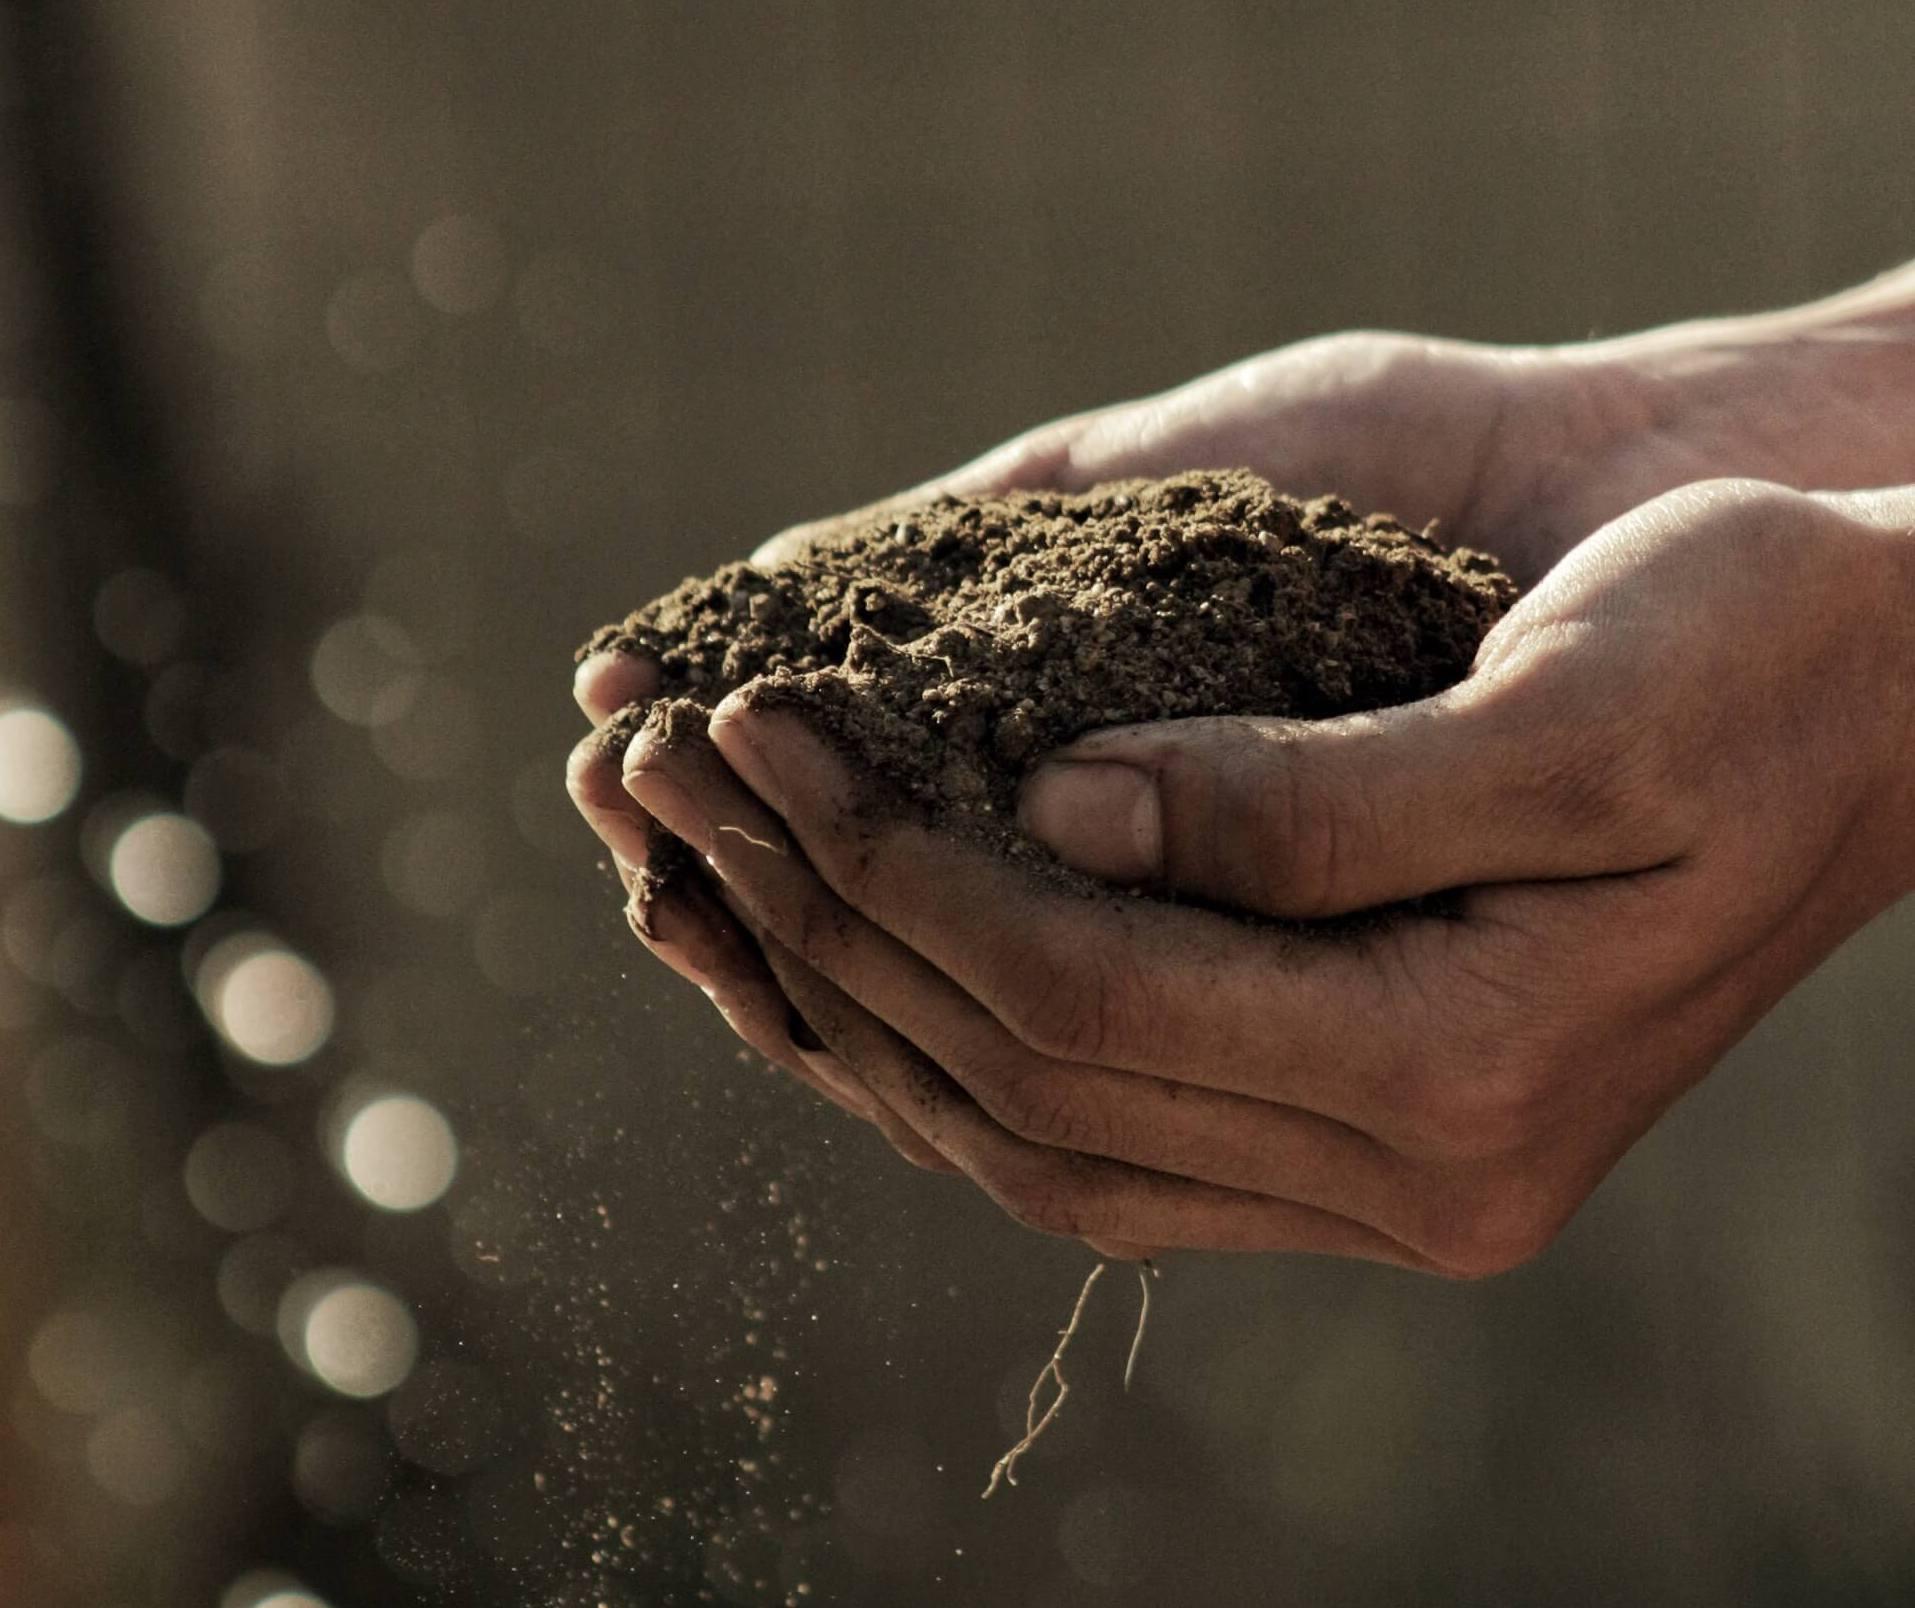 Compost for a Healthier Newburyport Campaign